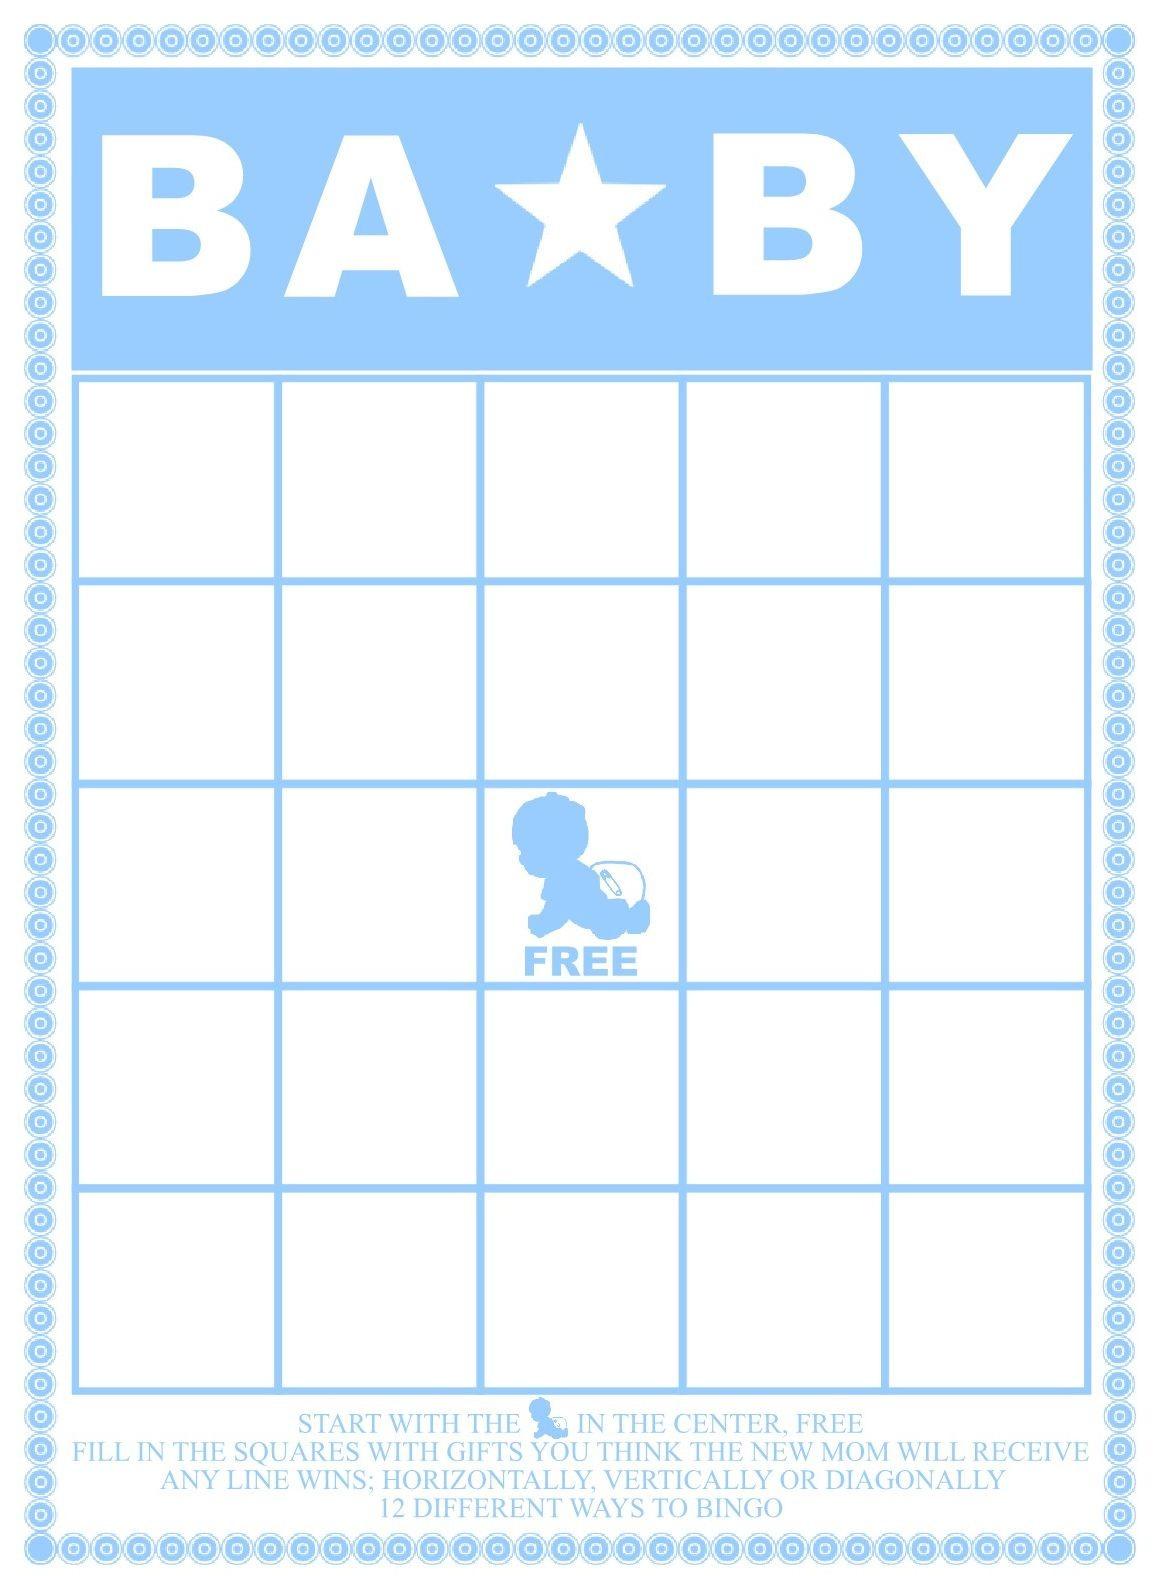 Baby Shower Bingo Card Template - Home Design Ideas - Home Design Ideas - Baby Bingo Free Printable Template